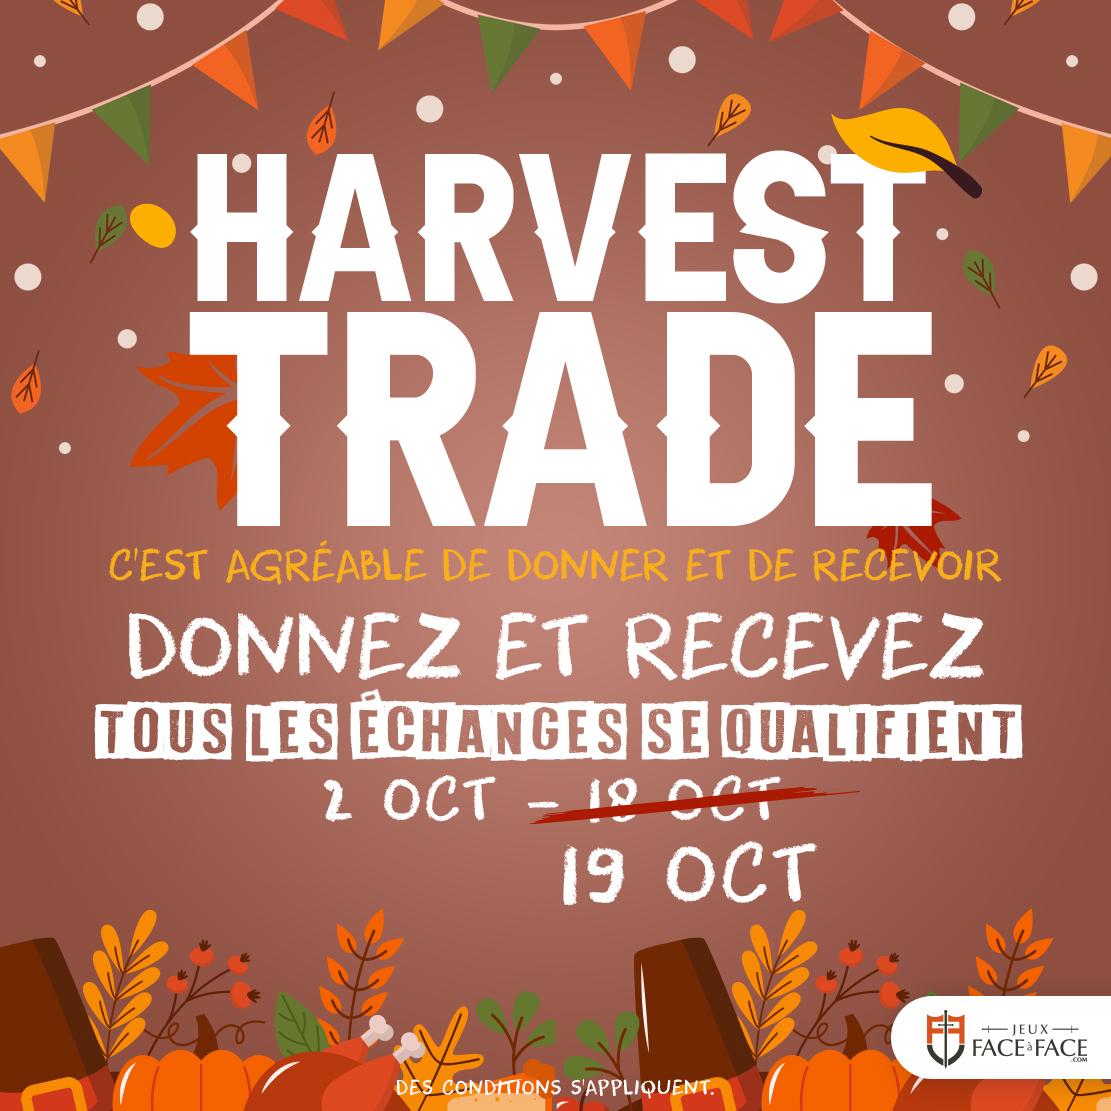 facebook-harvesttrade-copy.jpg